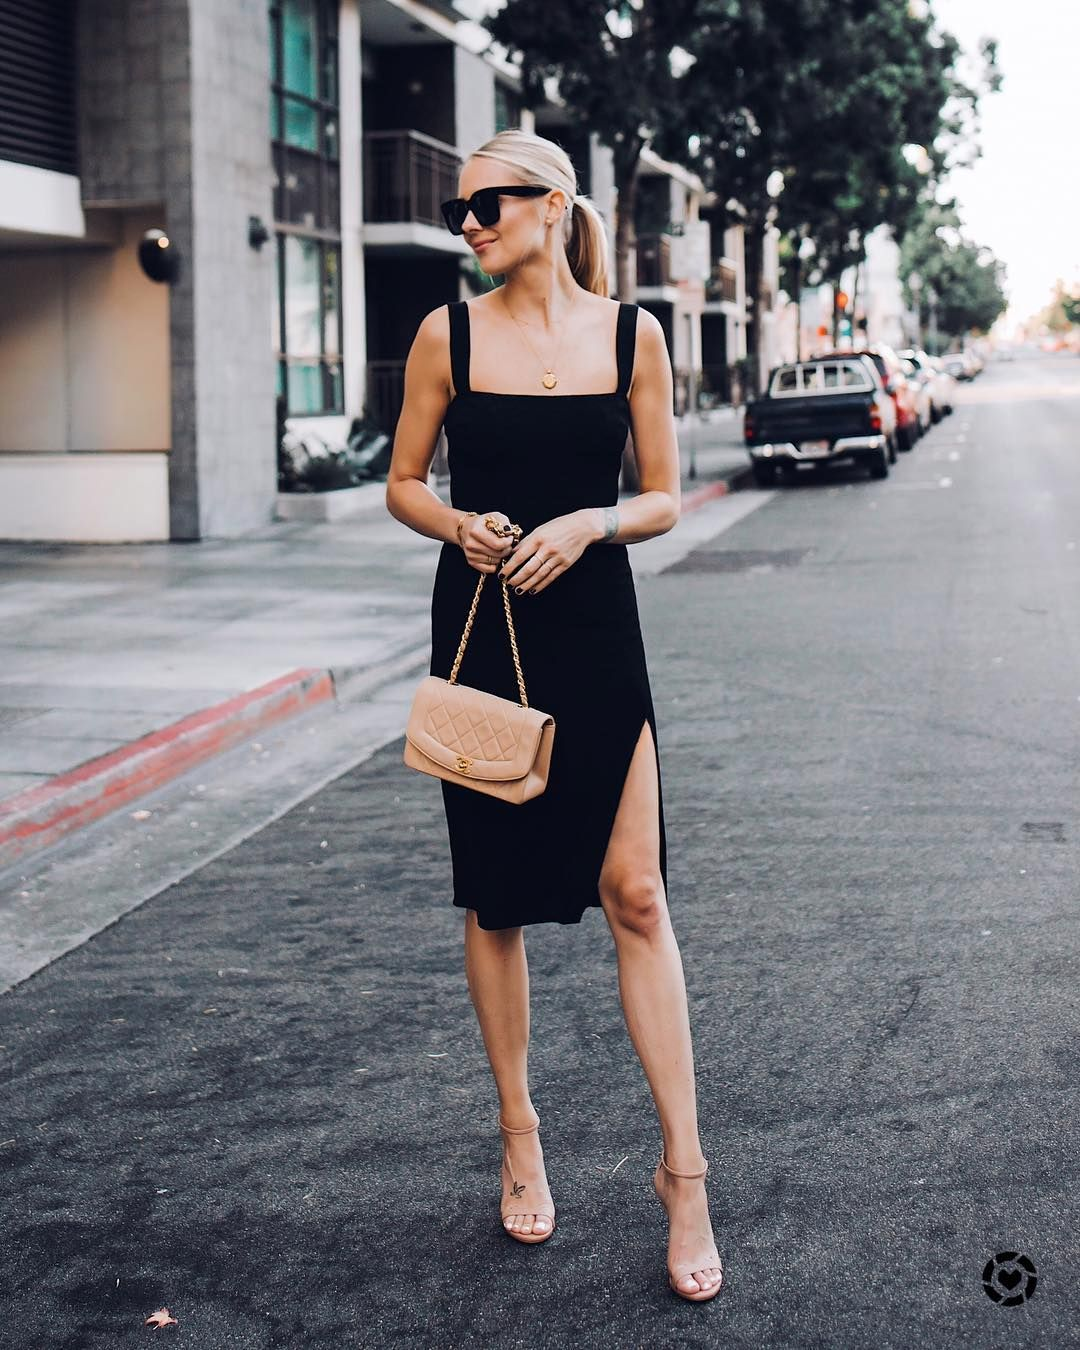 Nothing Better Than A Little Black Dress Sharing A Few Styles I M Loving Via Liketoknow It Download The Liketokno Fashion Jackson Fashion Little Black Dress [ 1350 x 1080 Pixel ]